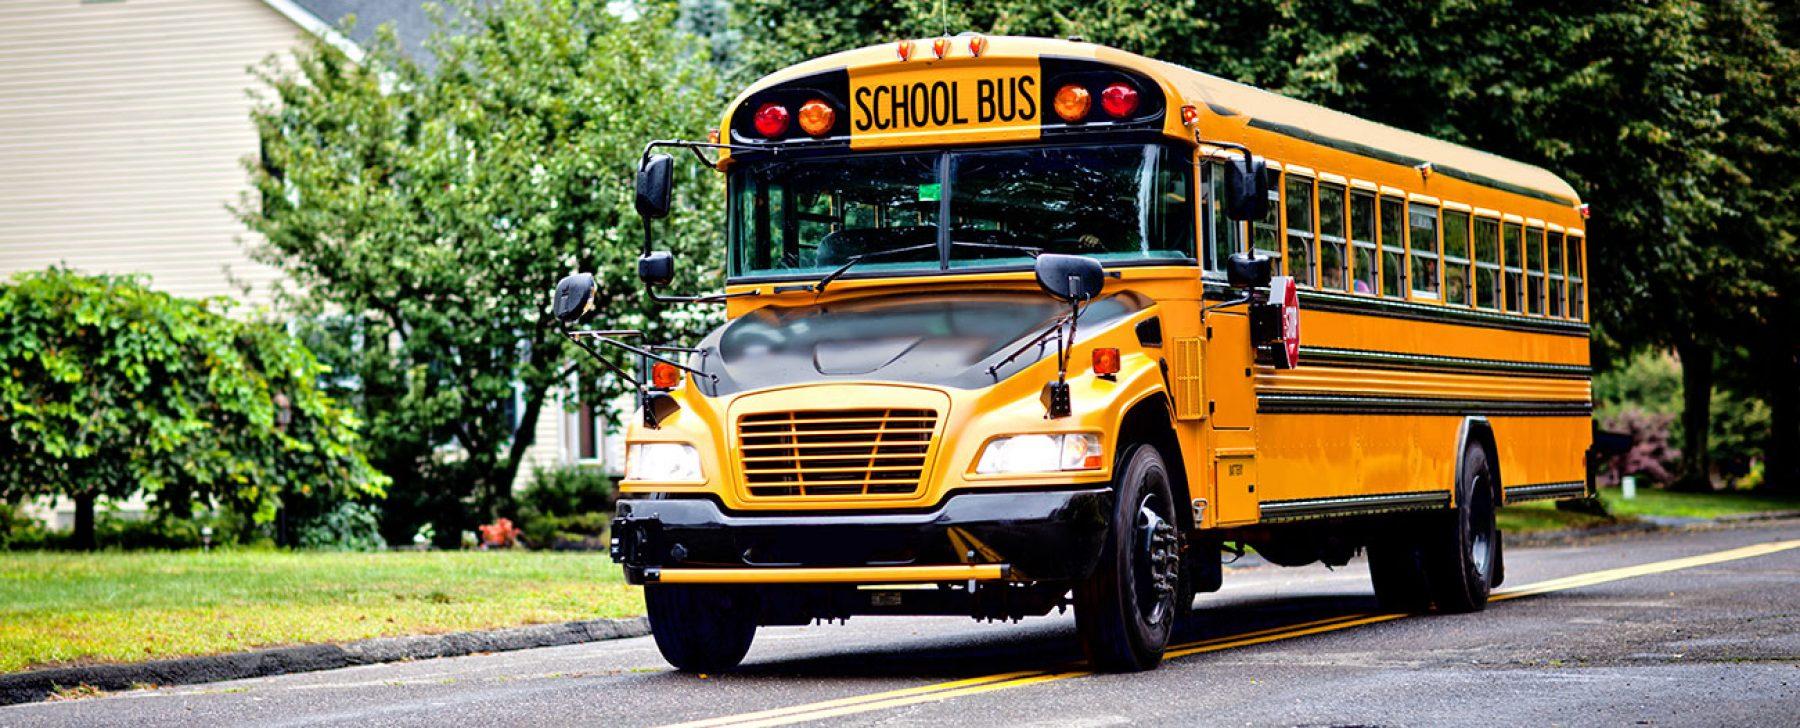 autobuses escolares americano